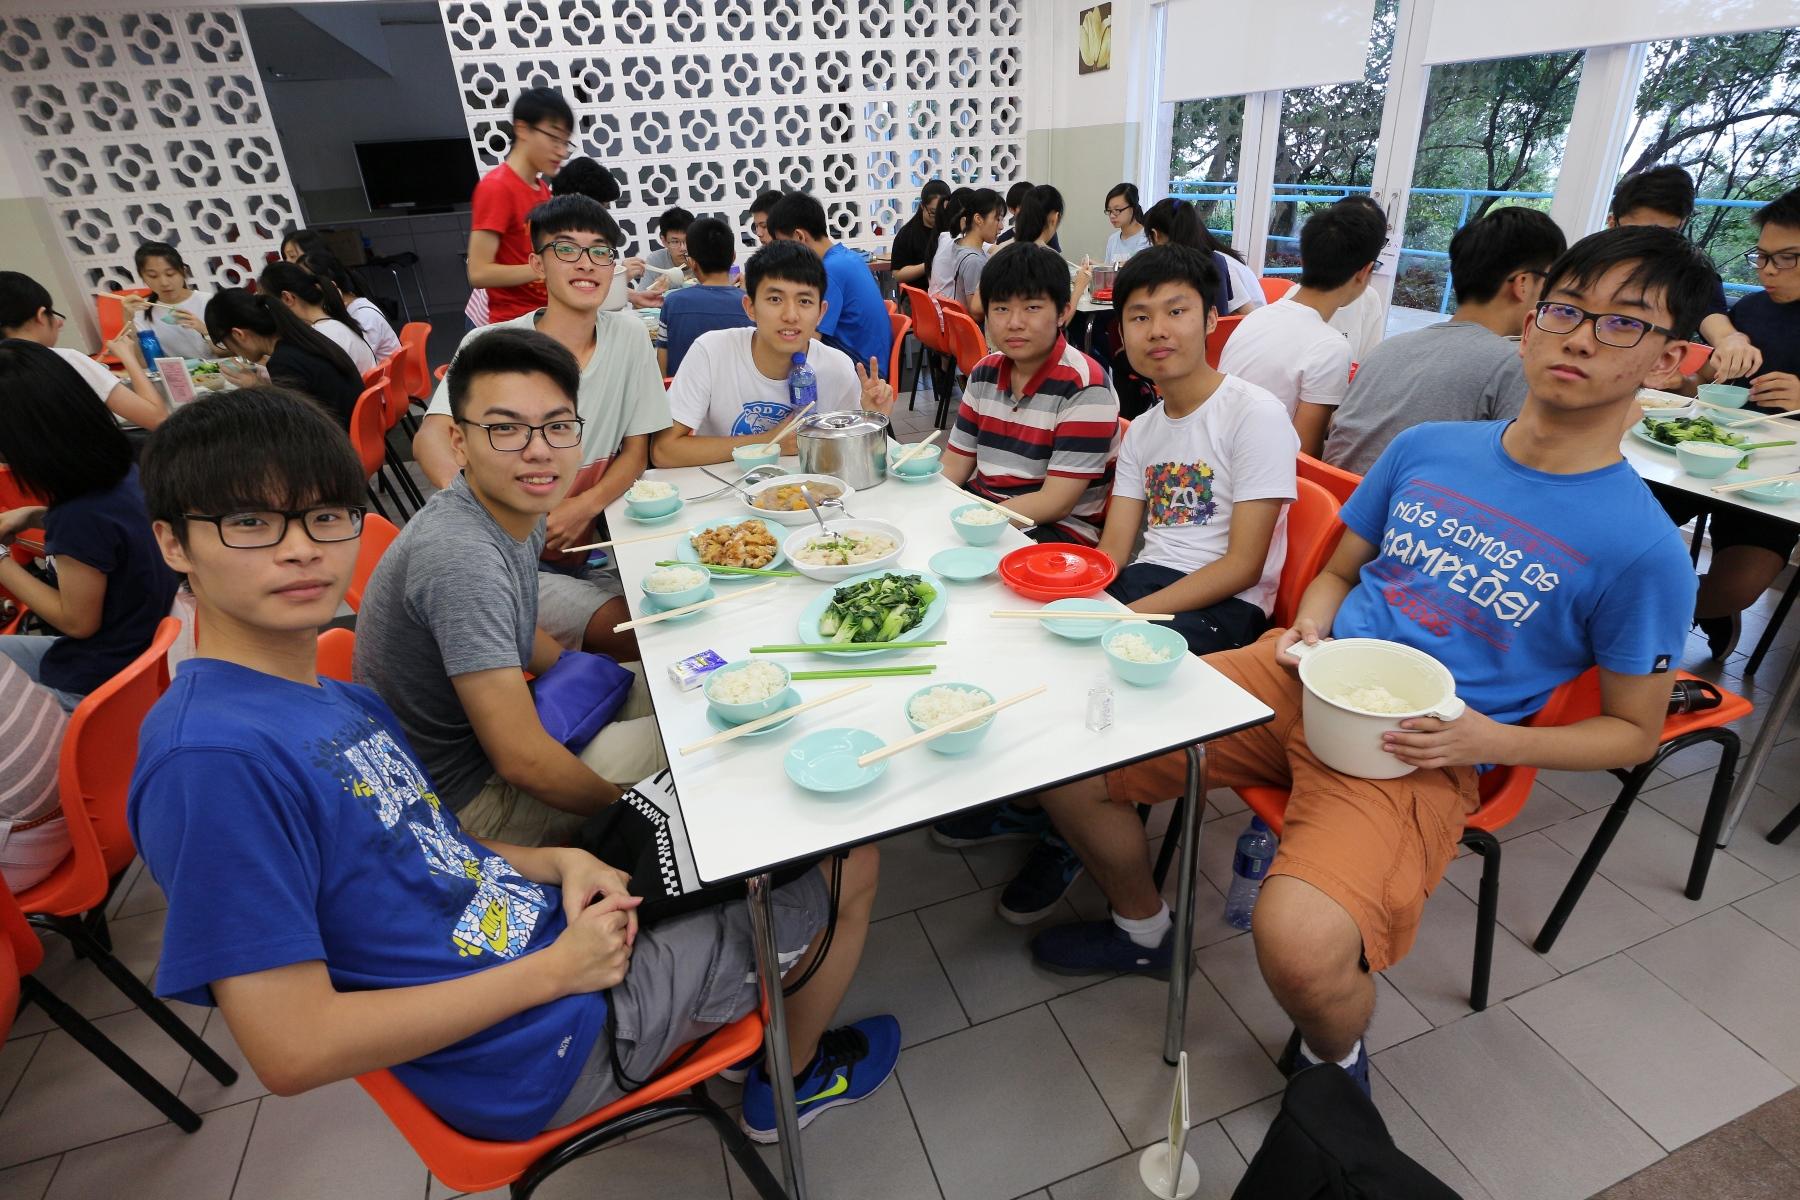 http://www.npc.edu.hk/sites/default/files/img_0578.jpg